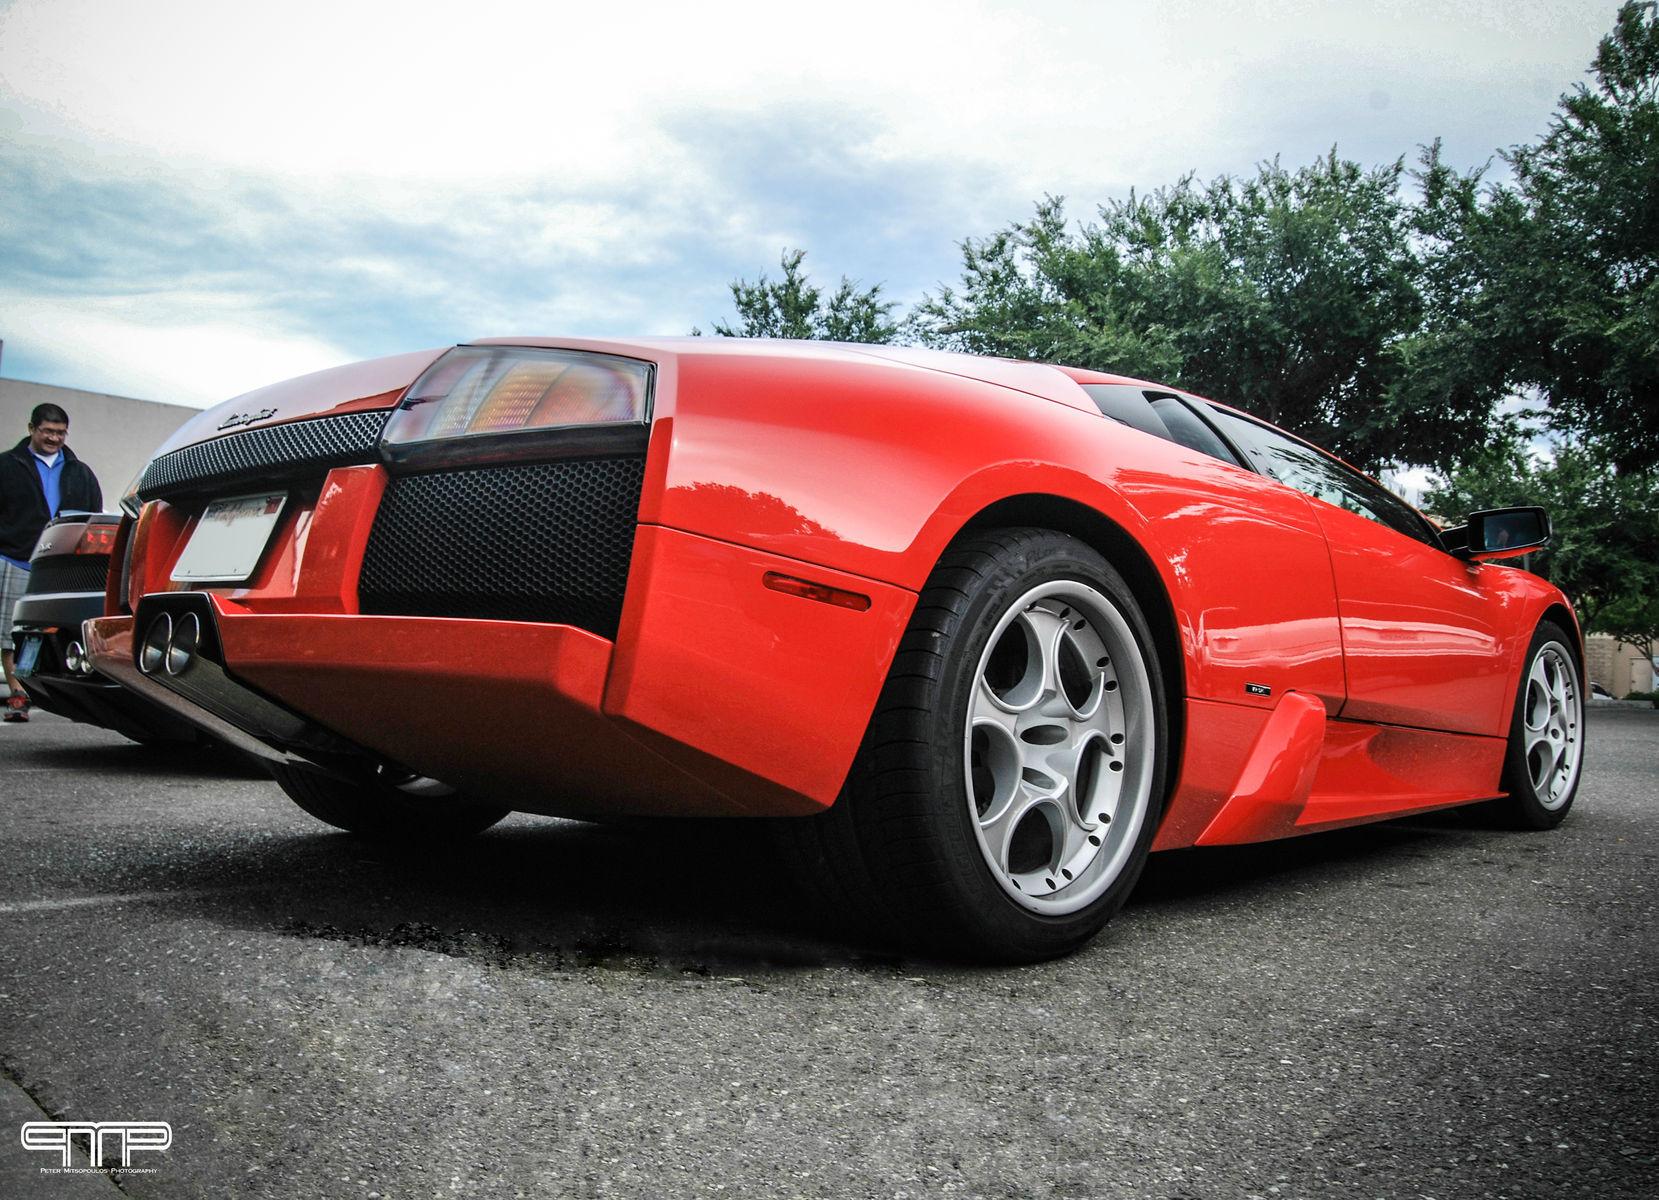 Lamborghini Murcielago | Lamborghini Murcielago